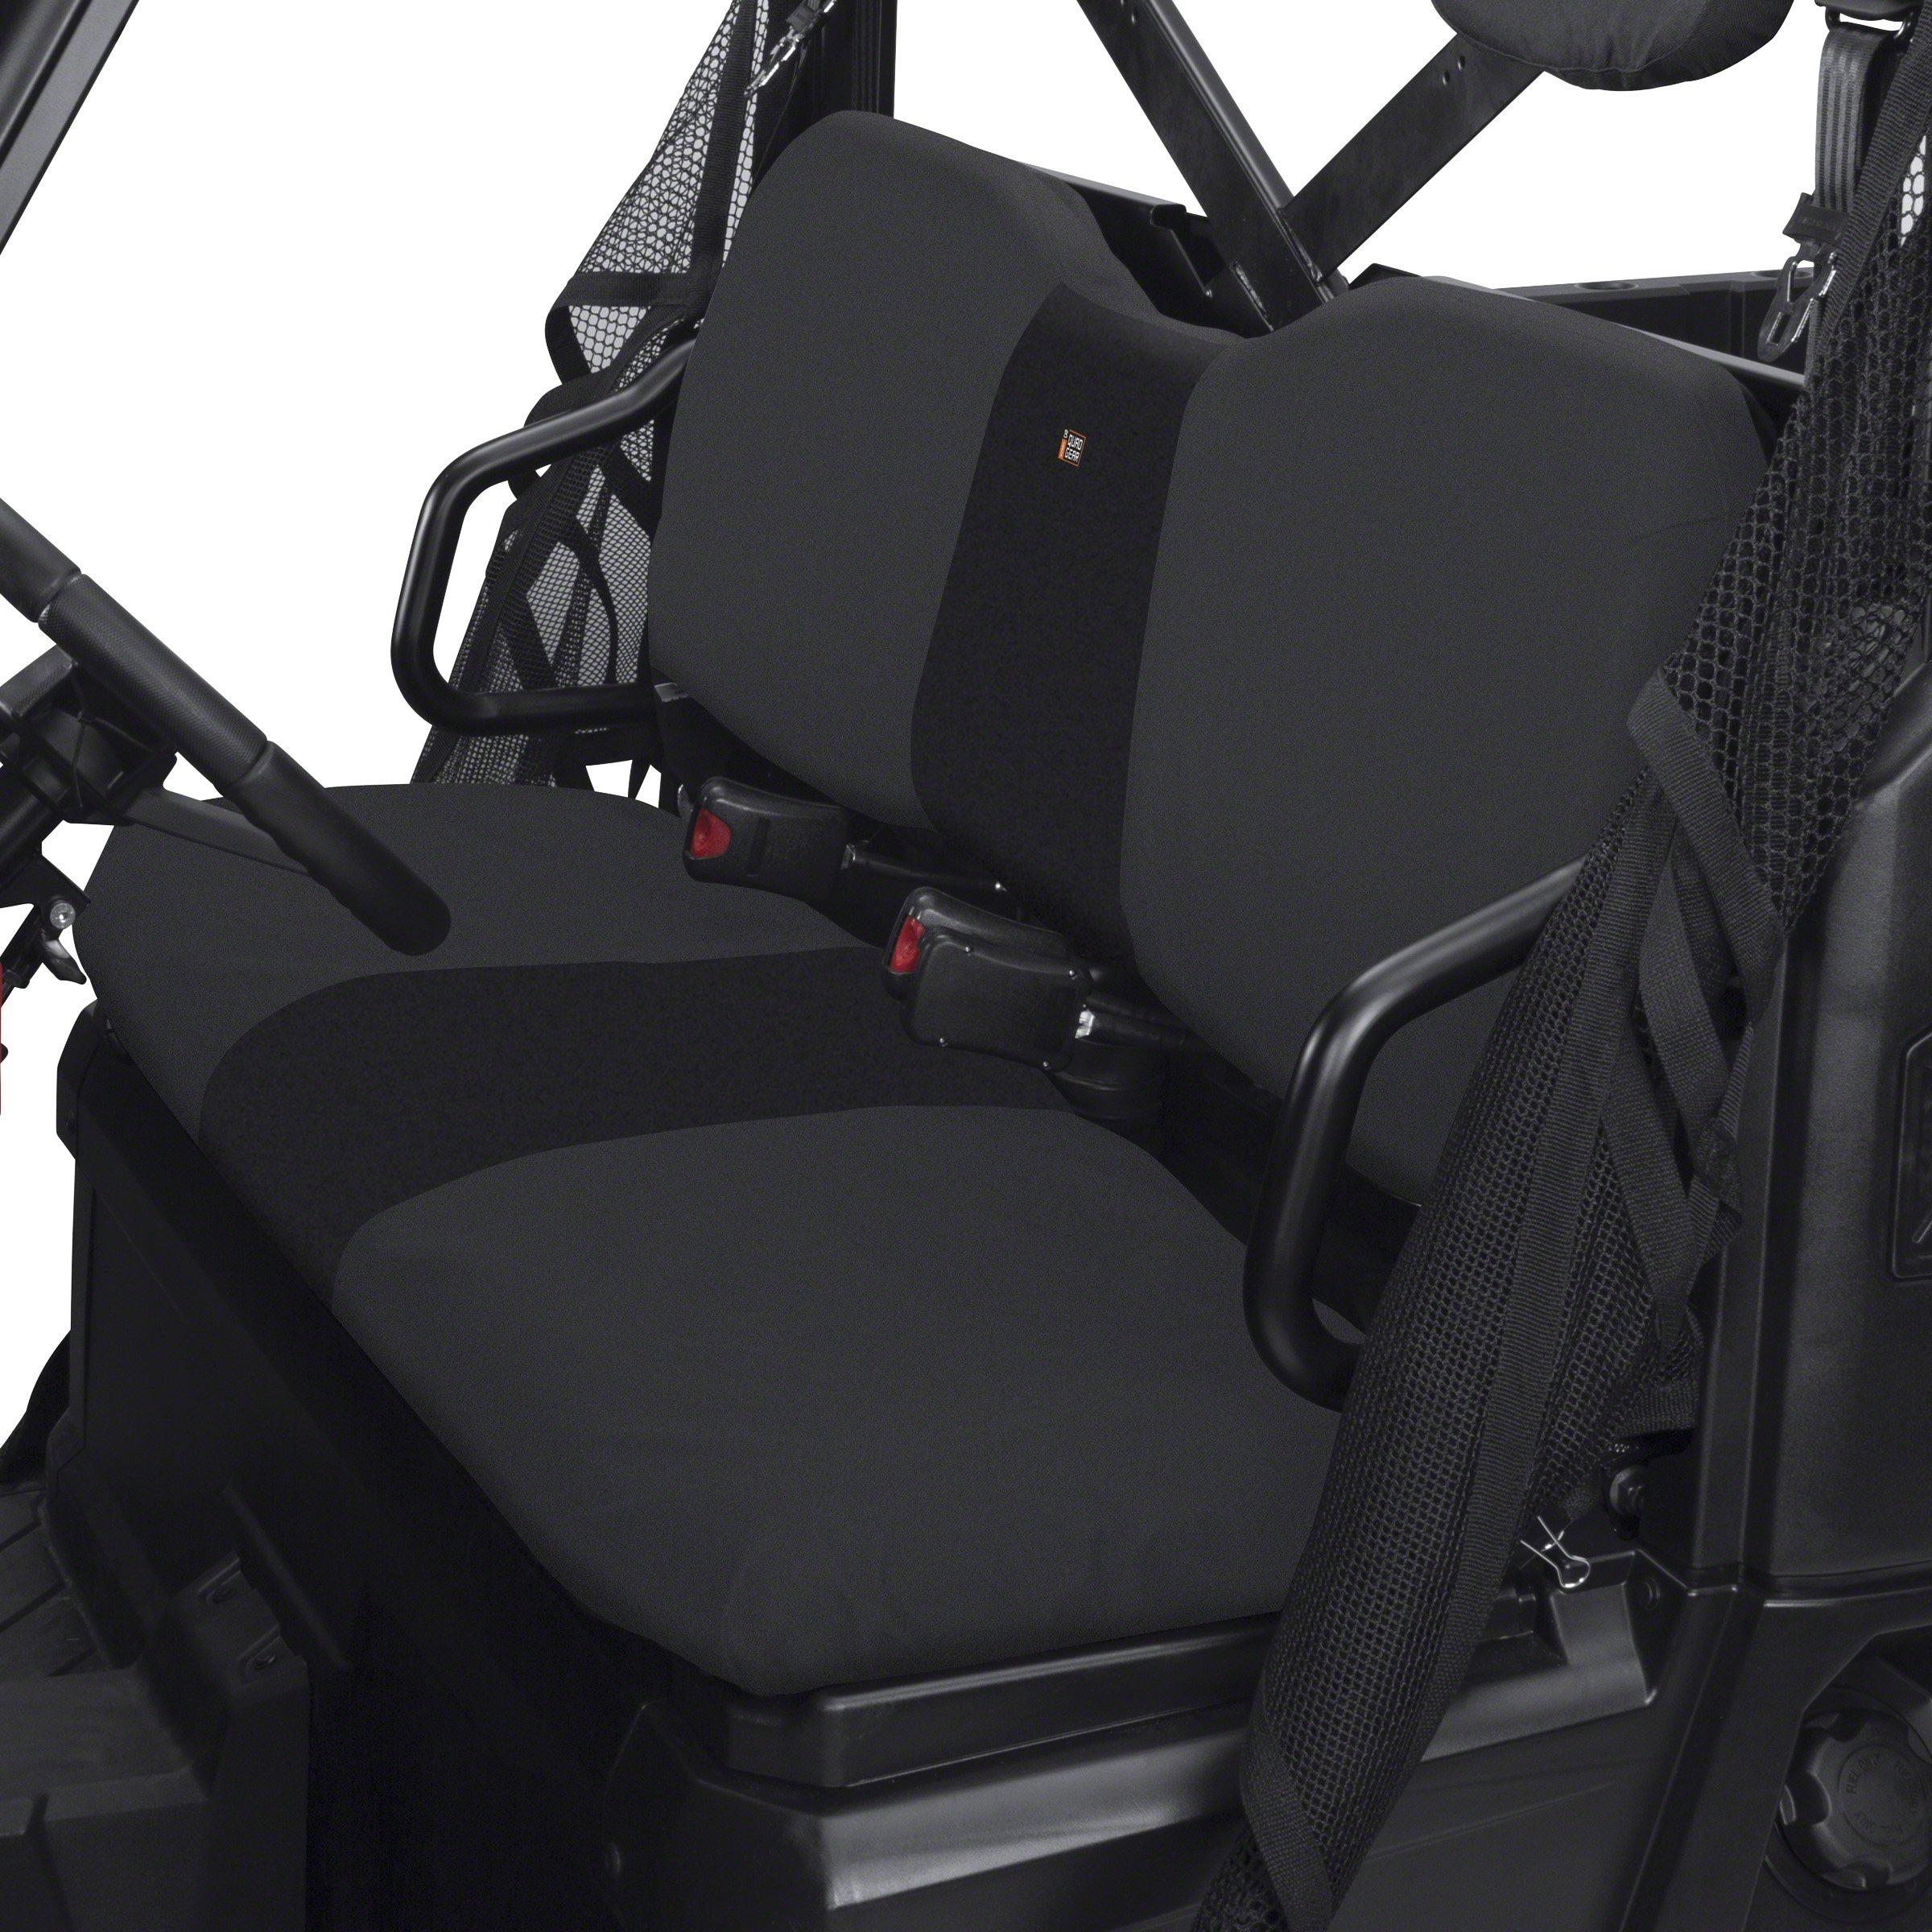 Classic Accessories 18-026-010401-00 QuadGear Black UTV Seat Cover by Classic Accessories